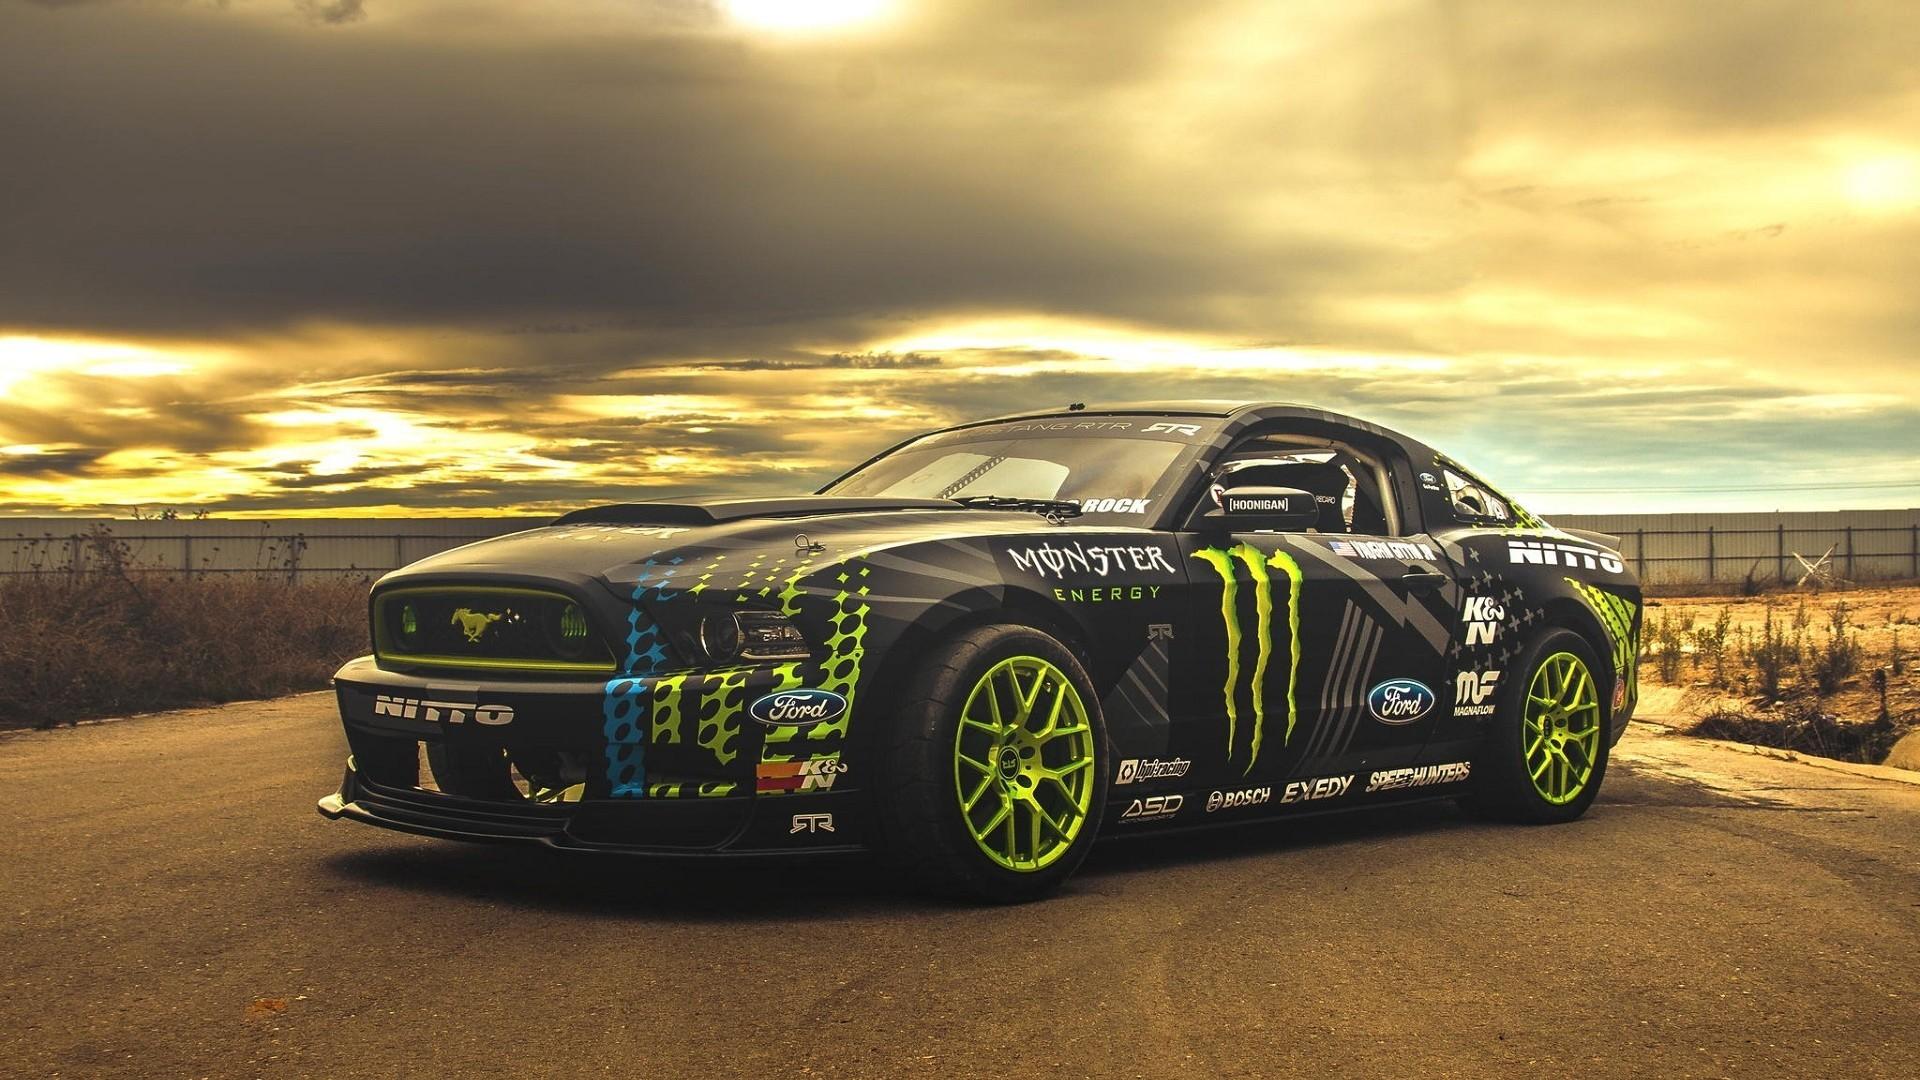 Wallpaper : Ford Mustang, Drifting, sports car ...